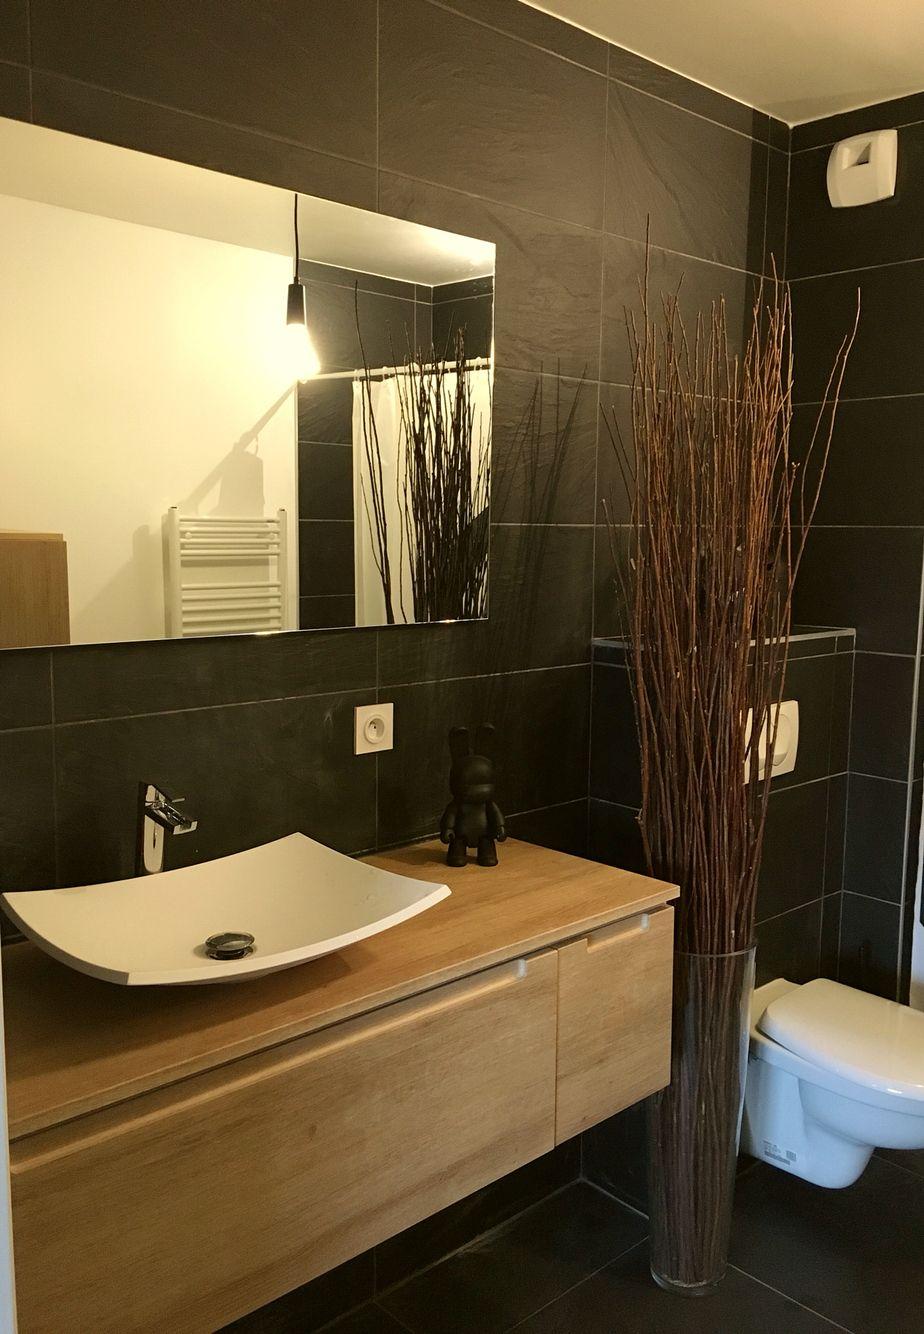 Salle de bain, noir, ardoise, bois, | Bathrooms | Salle de ...